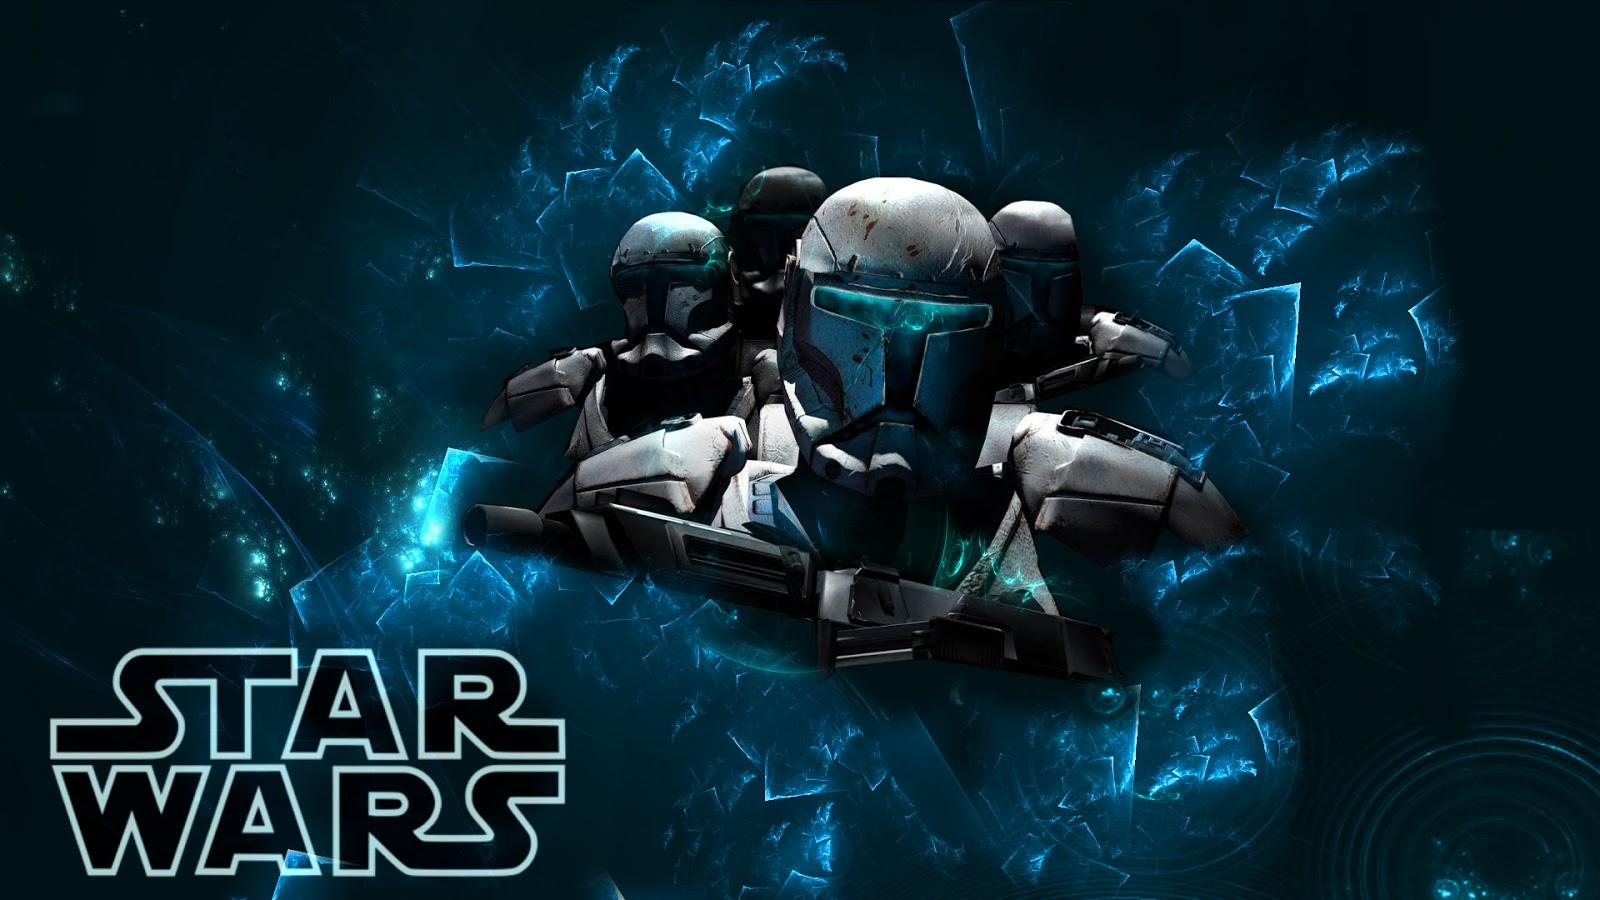 Star Wars Clone Trooper Wallpaper